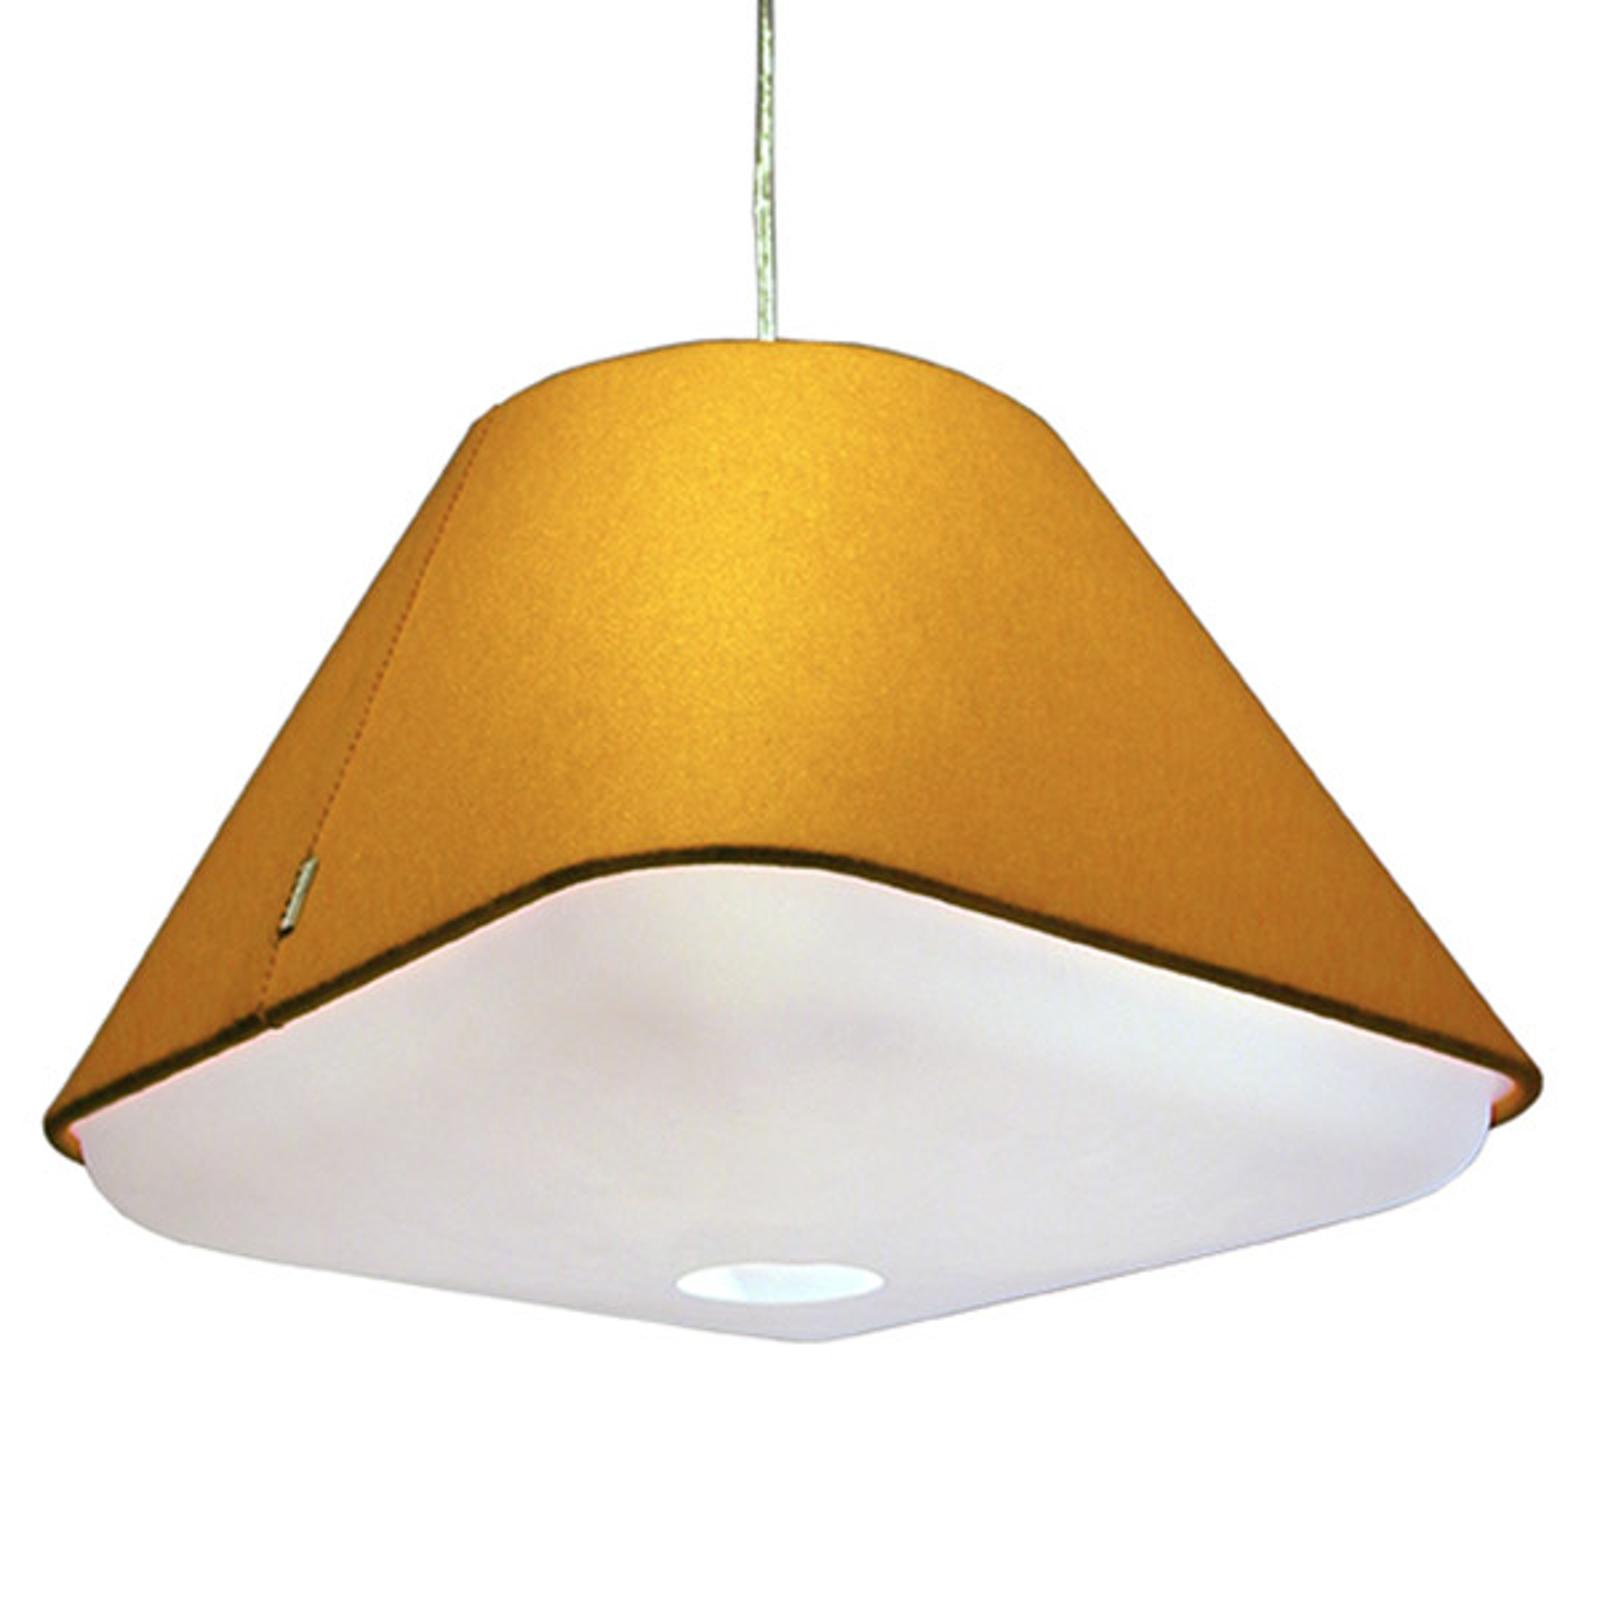 Innermost RD2SQ 40 - závěsné světlo okr